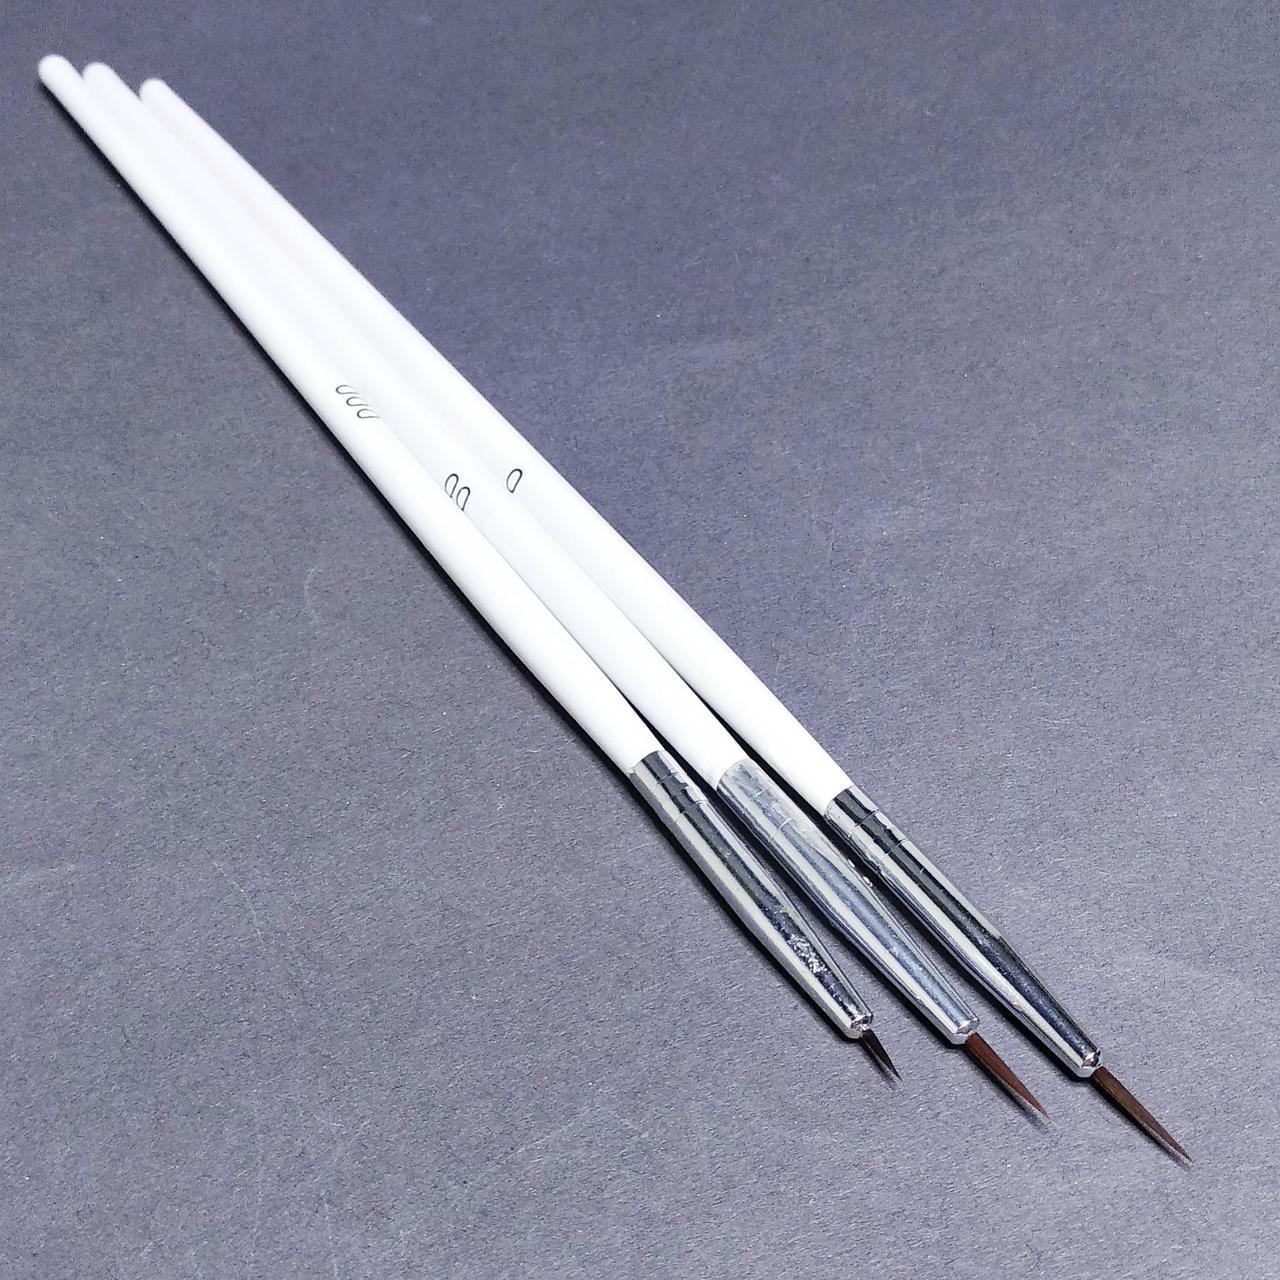 Кисти для росписи ногтей 3 шт